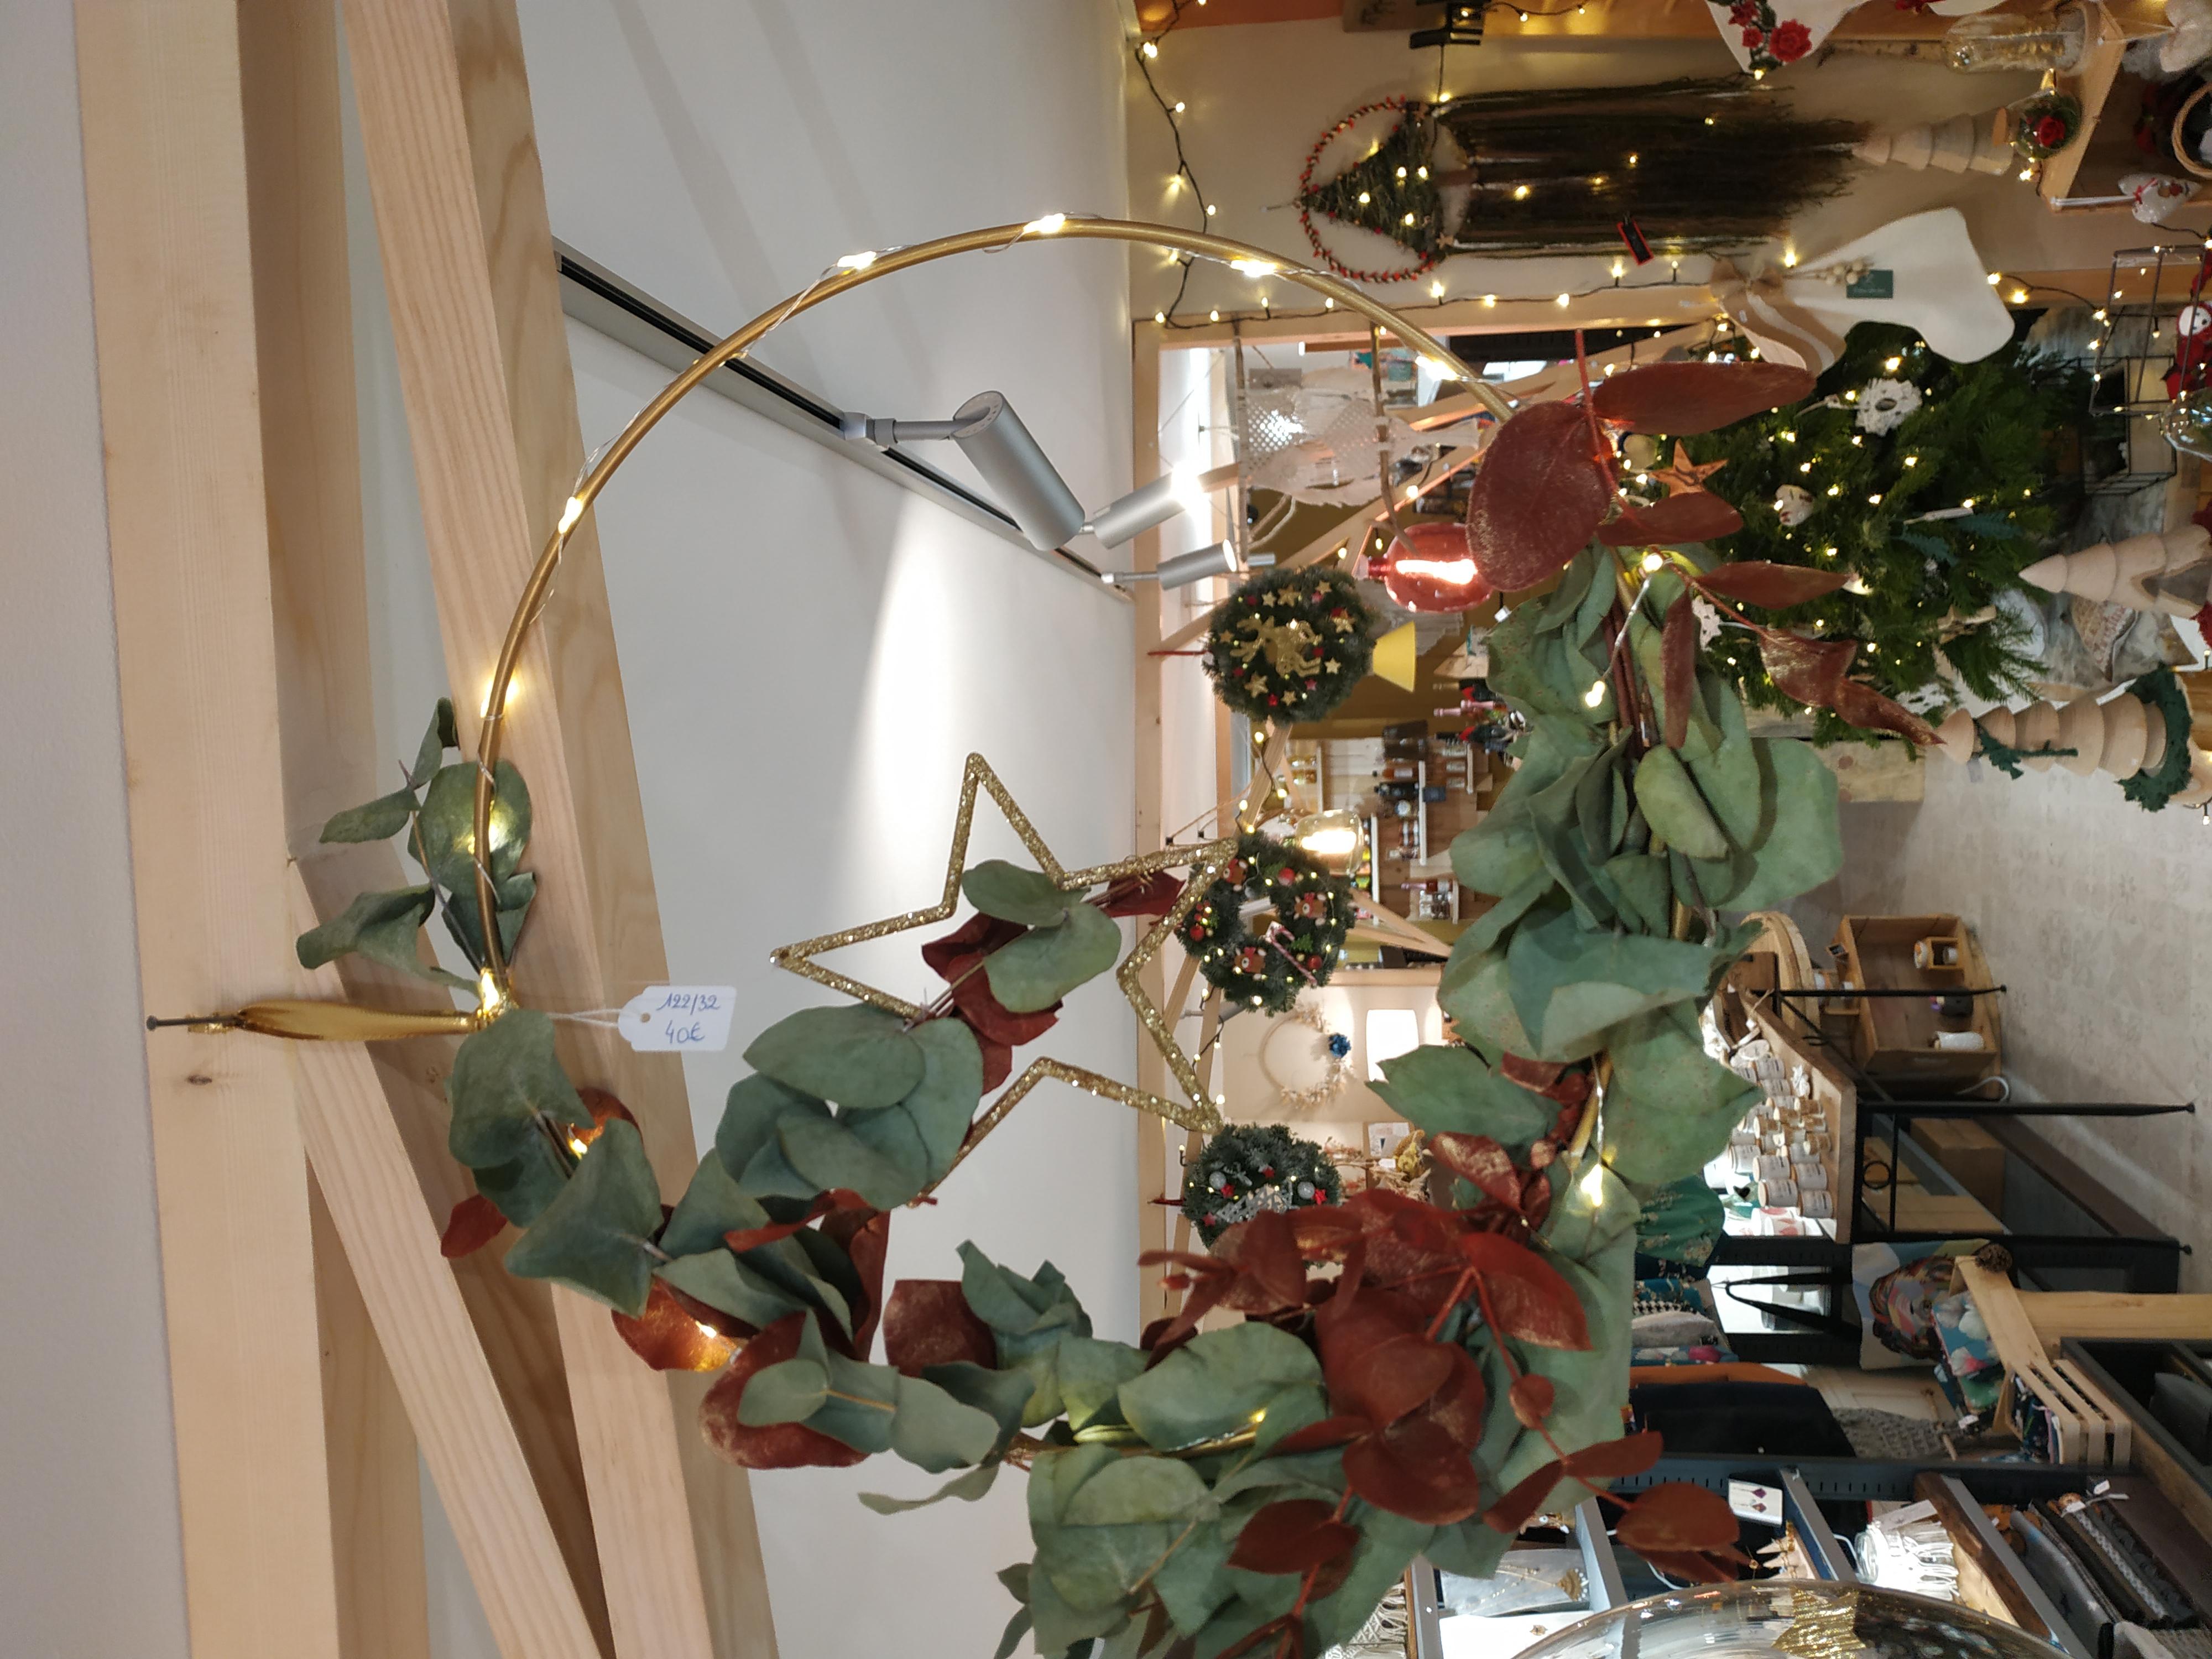 couronnes d'eucalyptus